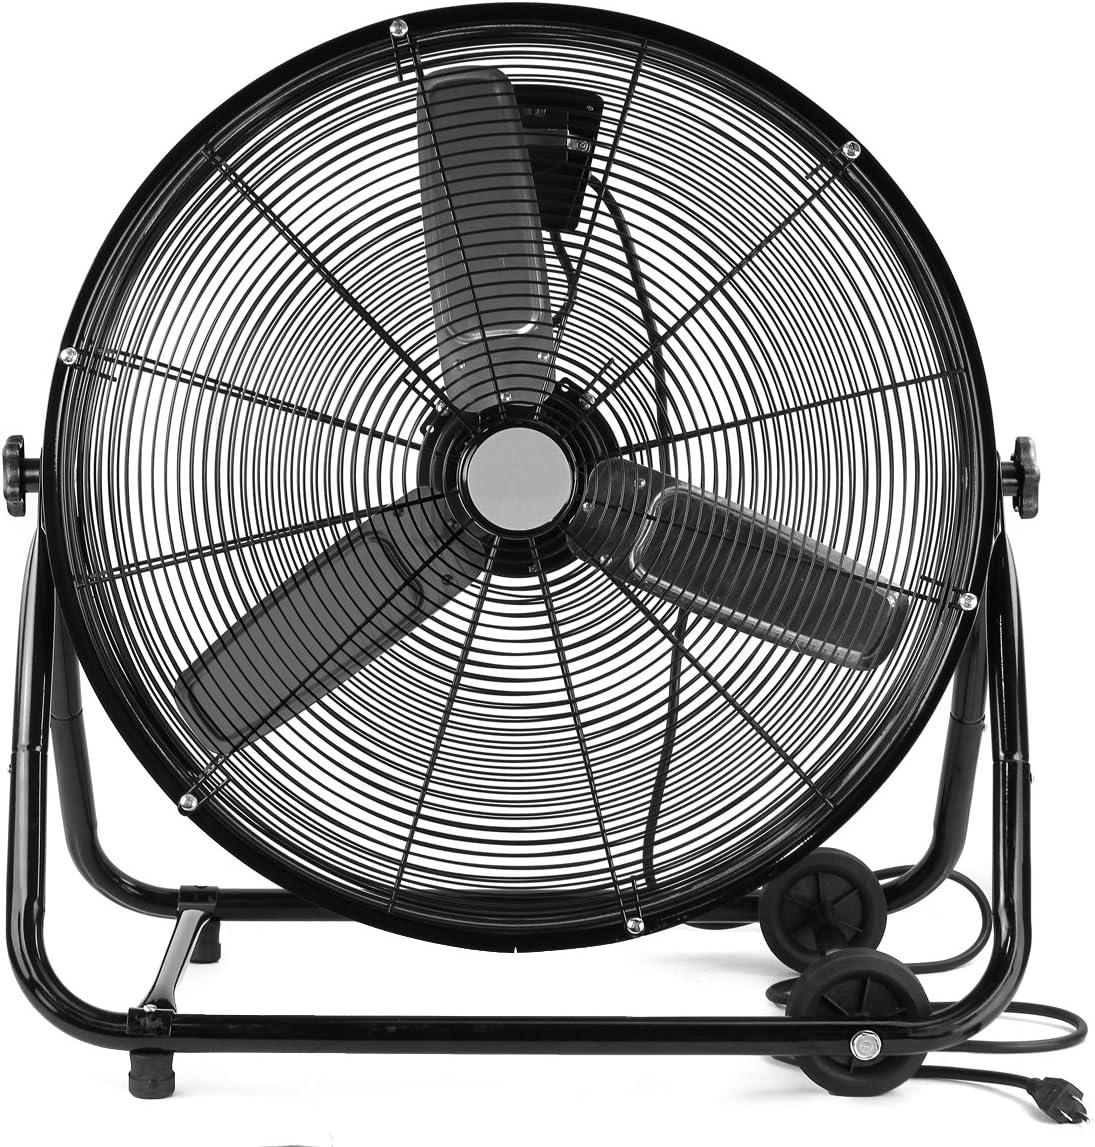 "XtremepowerUS High Velocity 24"" Rolling Drum Floor Fan Shop Fan Adjustable Speed Air Flow Garage Warehouse w/Built-in Wheel"